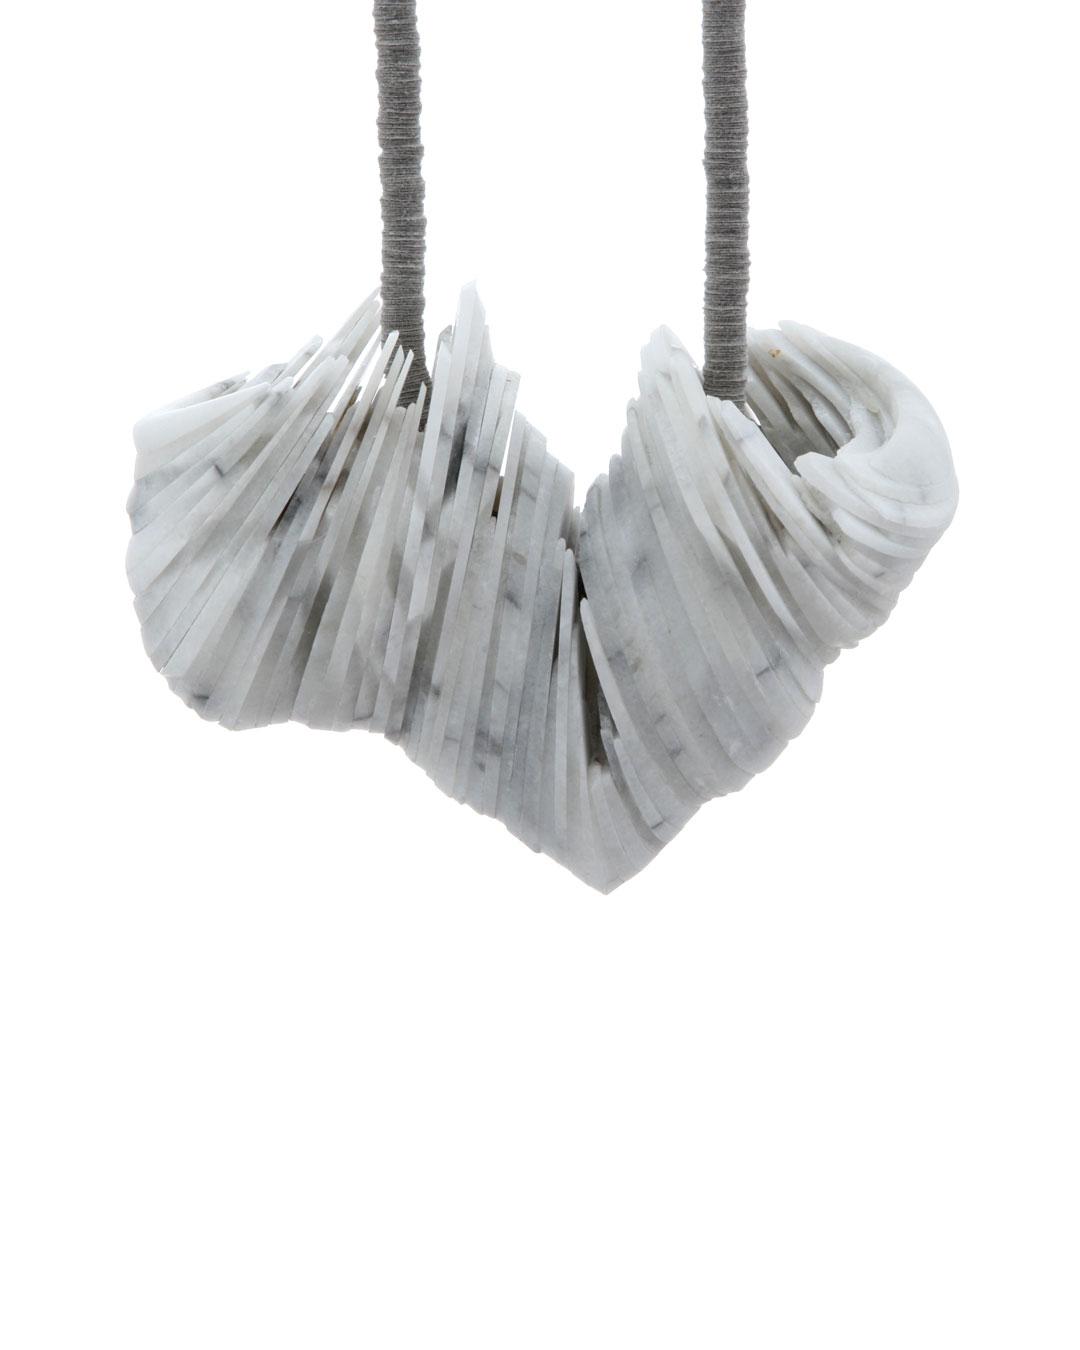 Tarja Tuupanen, untitled, 2015, necklace; ready-made marble tableware, velour sticker, steel wire, brass, 450 x 100 x 40 mm, €1700